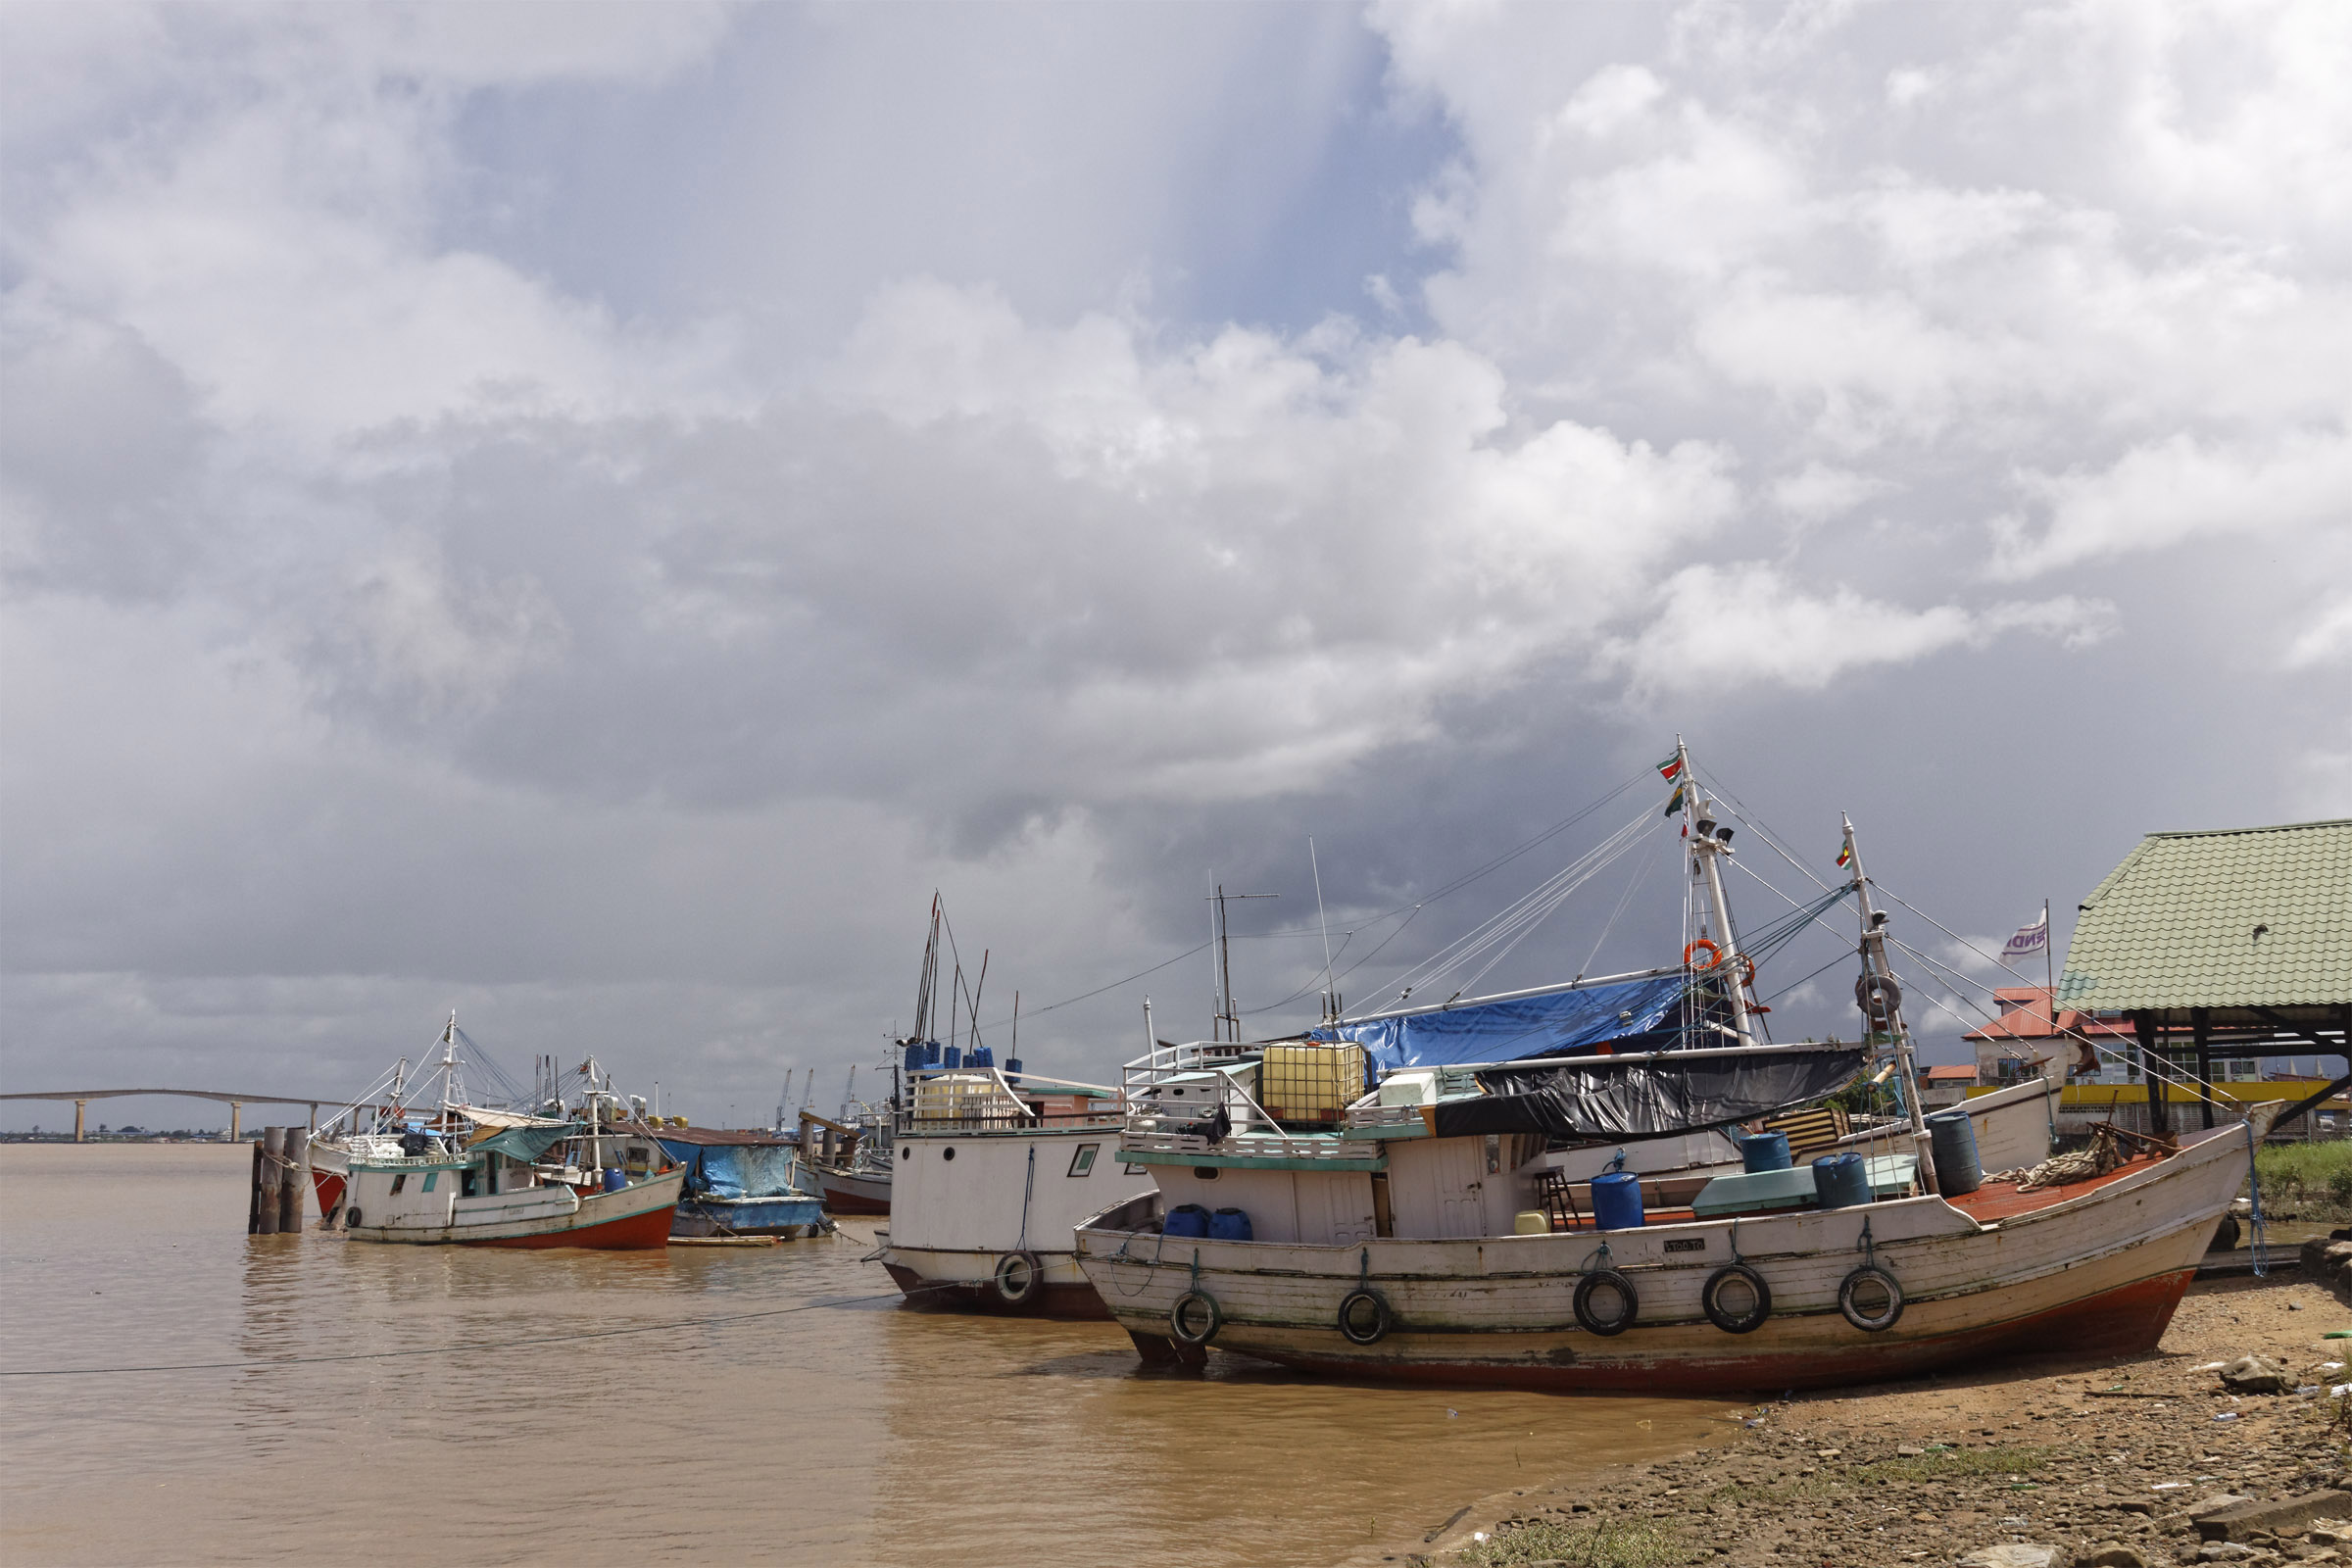 Fishing boats, Adventure, Nets, Vessel, Tropical, HQ Photo